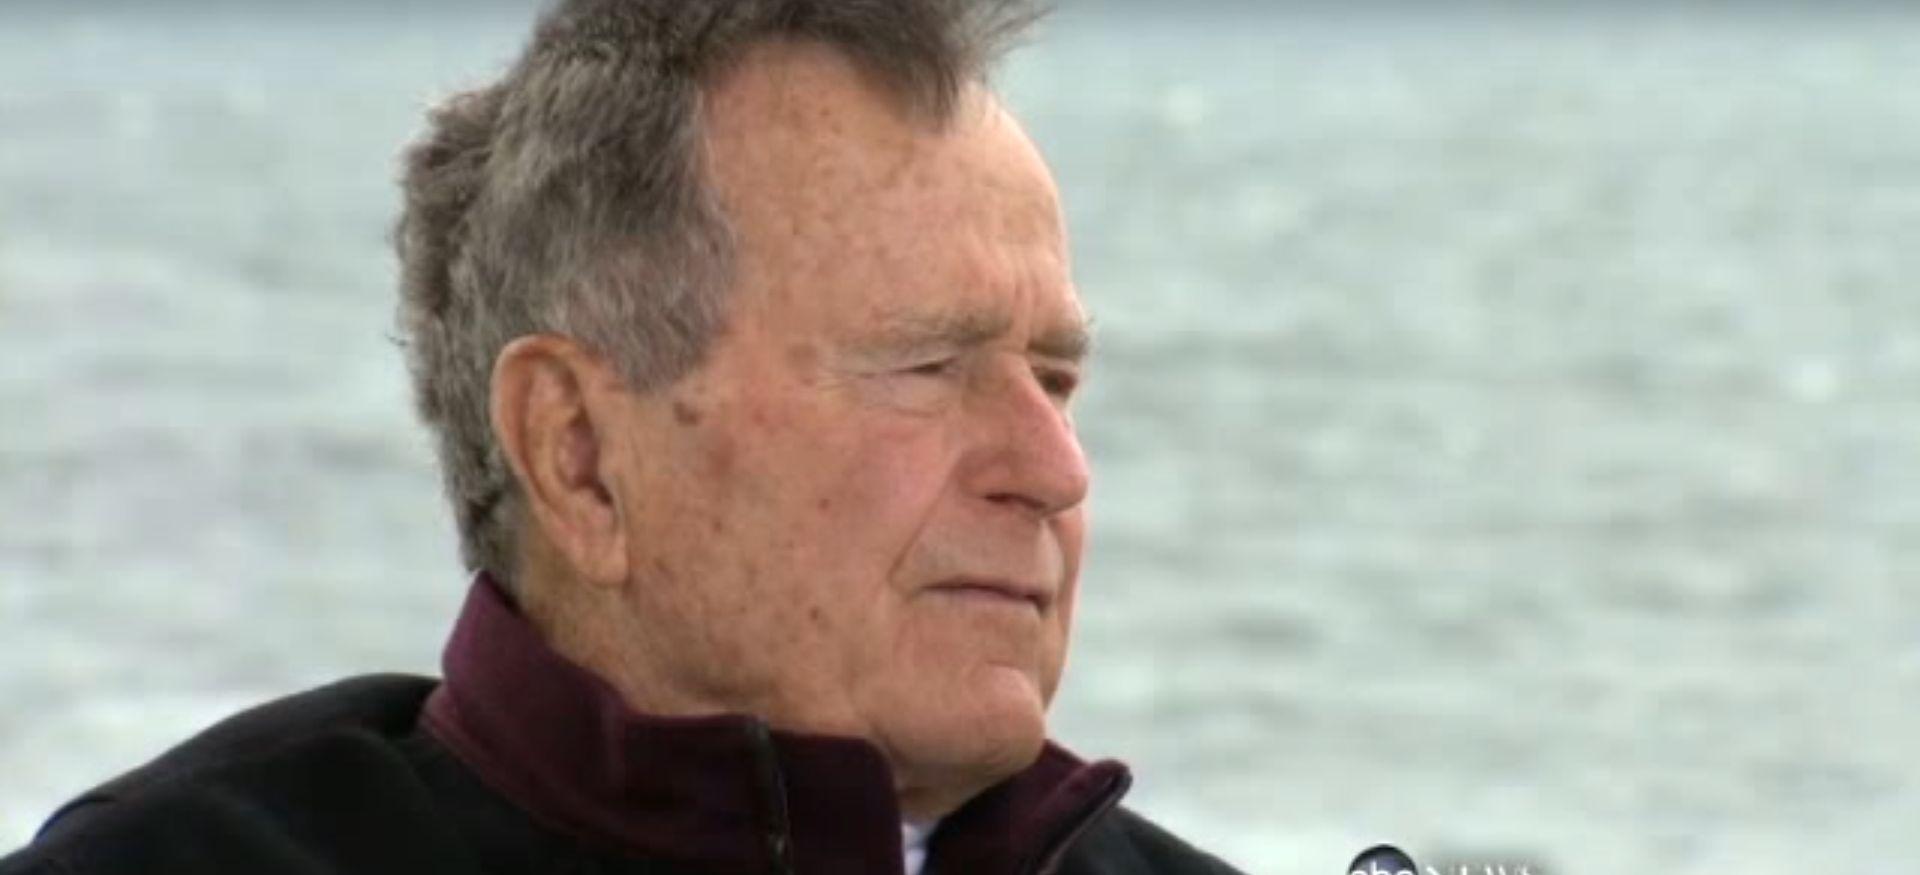 George HW Bush (92) pušten iz bolnice